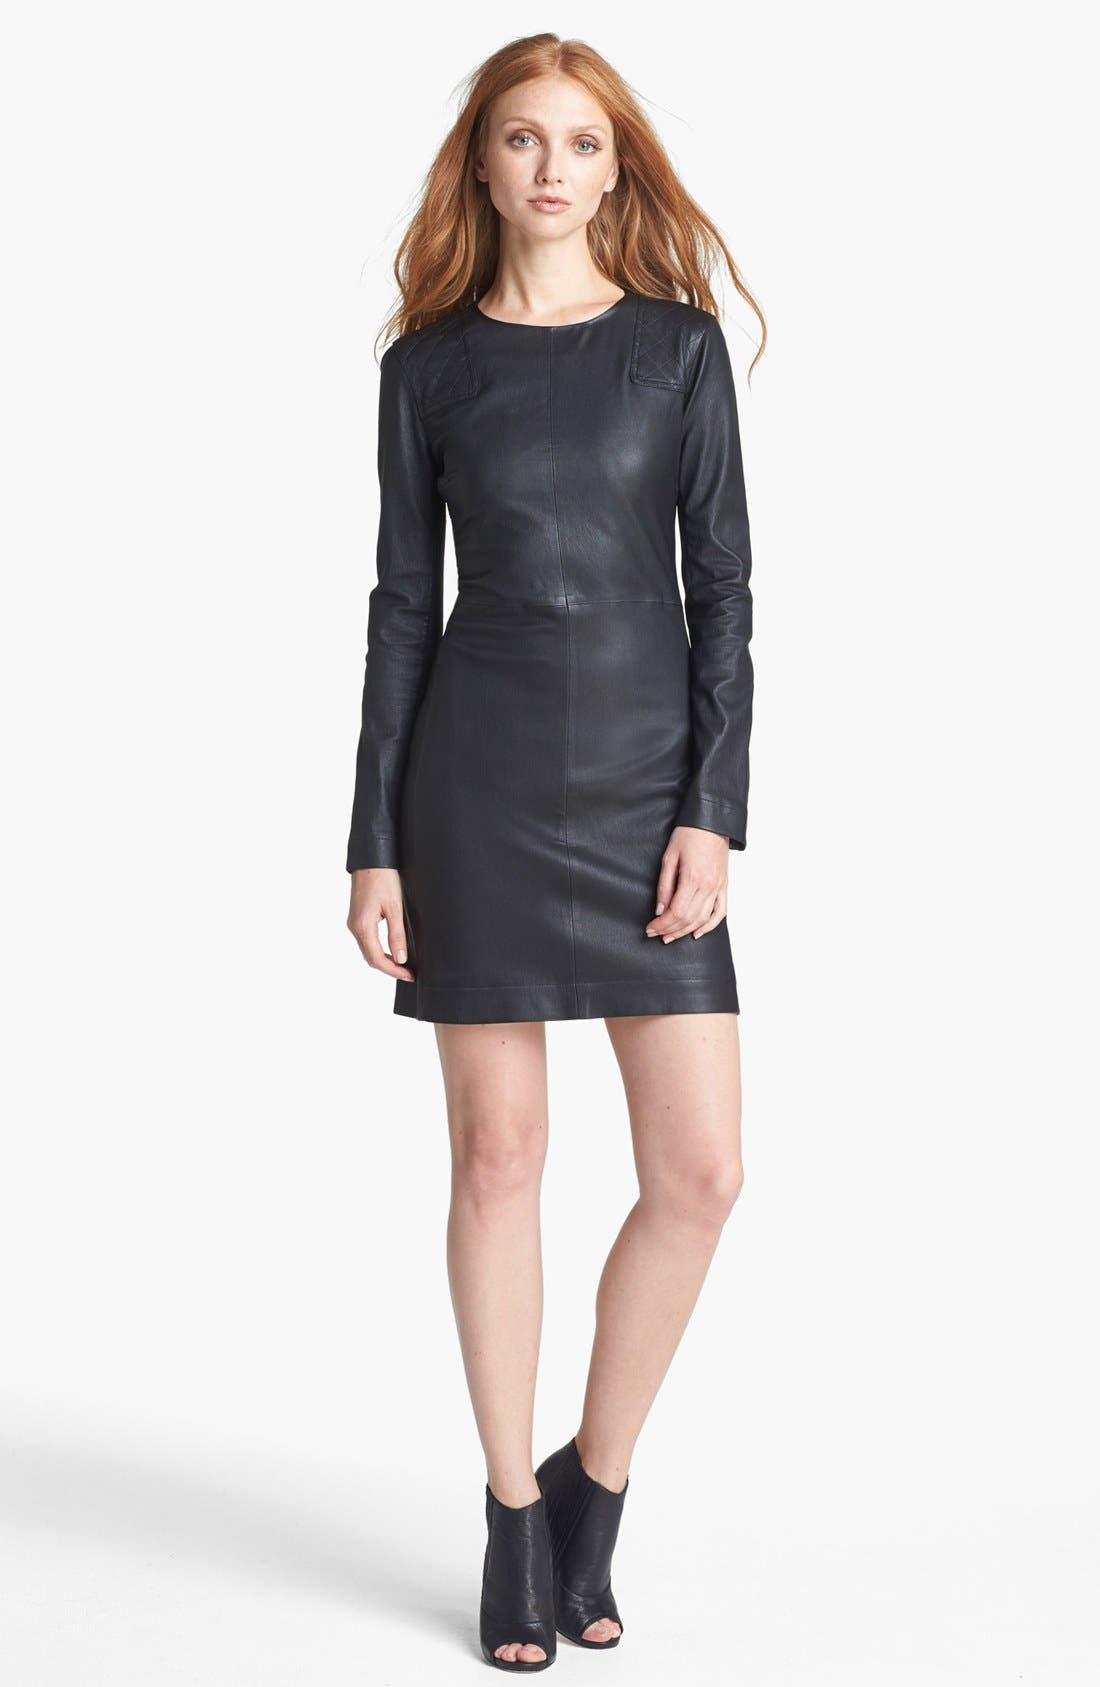 Main Image - MARC BY MARC JACOBS 'Lena' Leather Sheath Dress